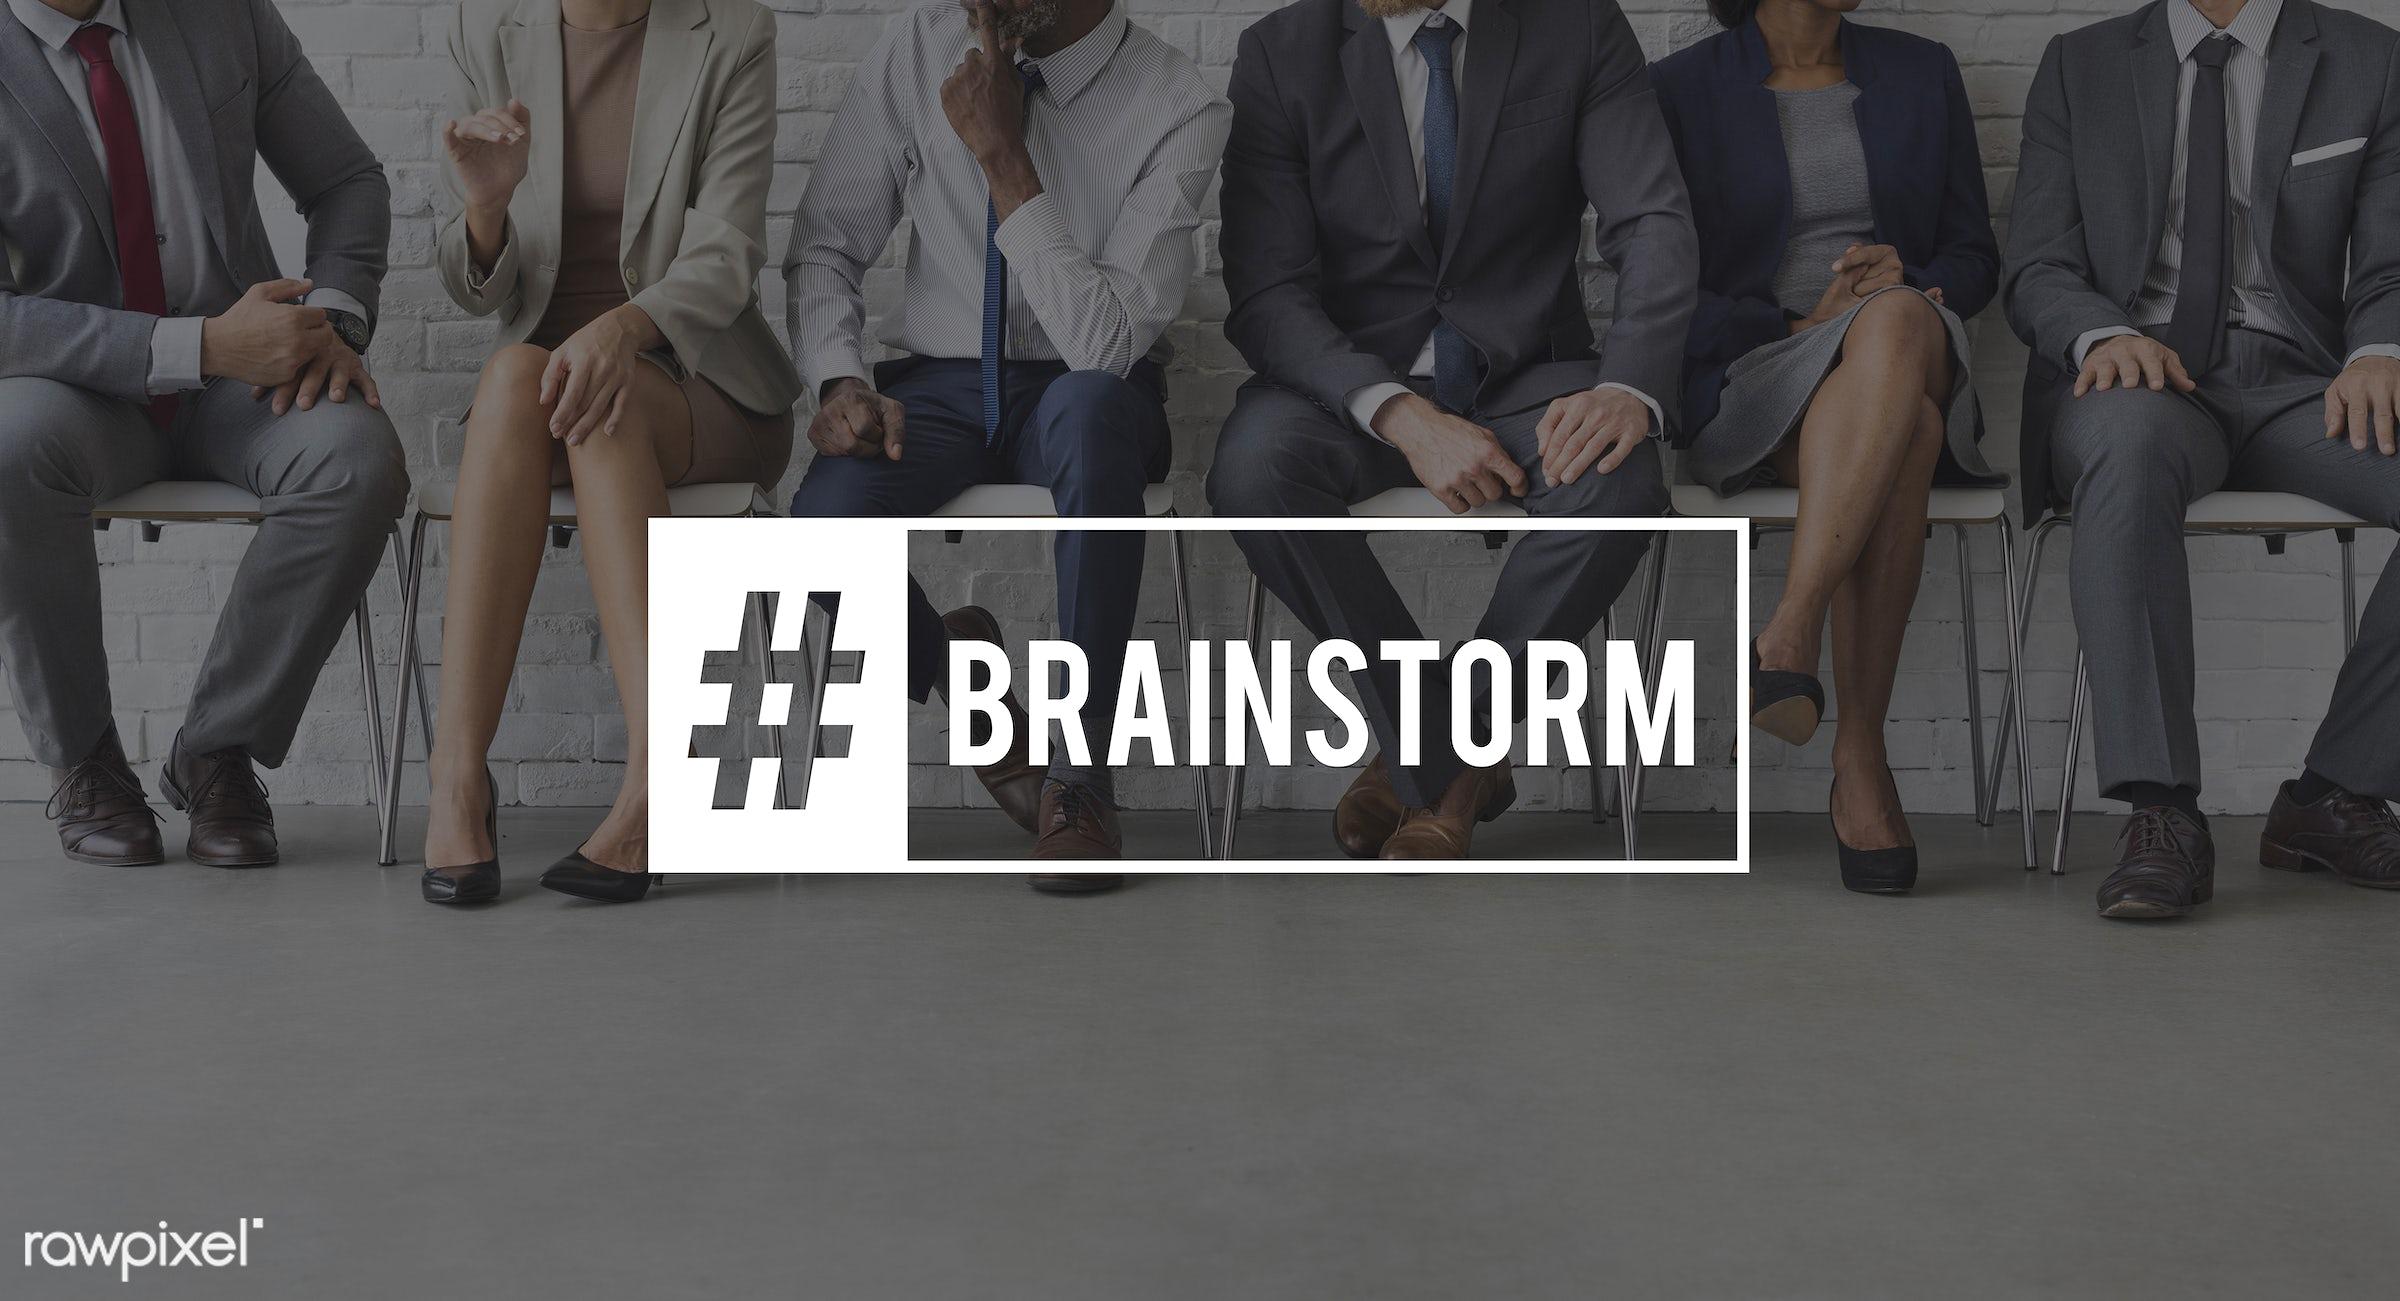 forum, african descent, asian ethnicity, brainstorm, briefing, business, business people, business plan, businessmen,...